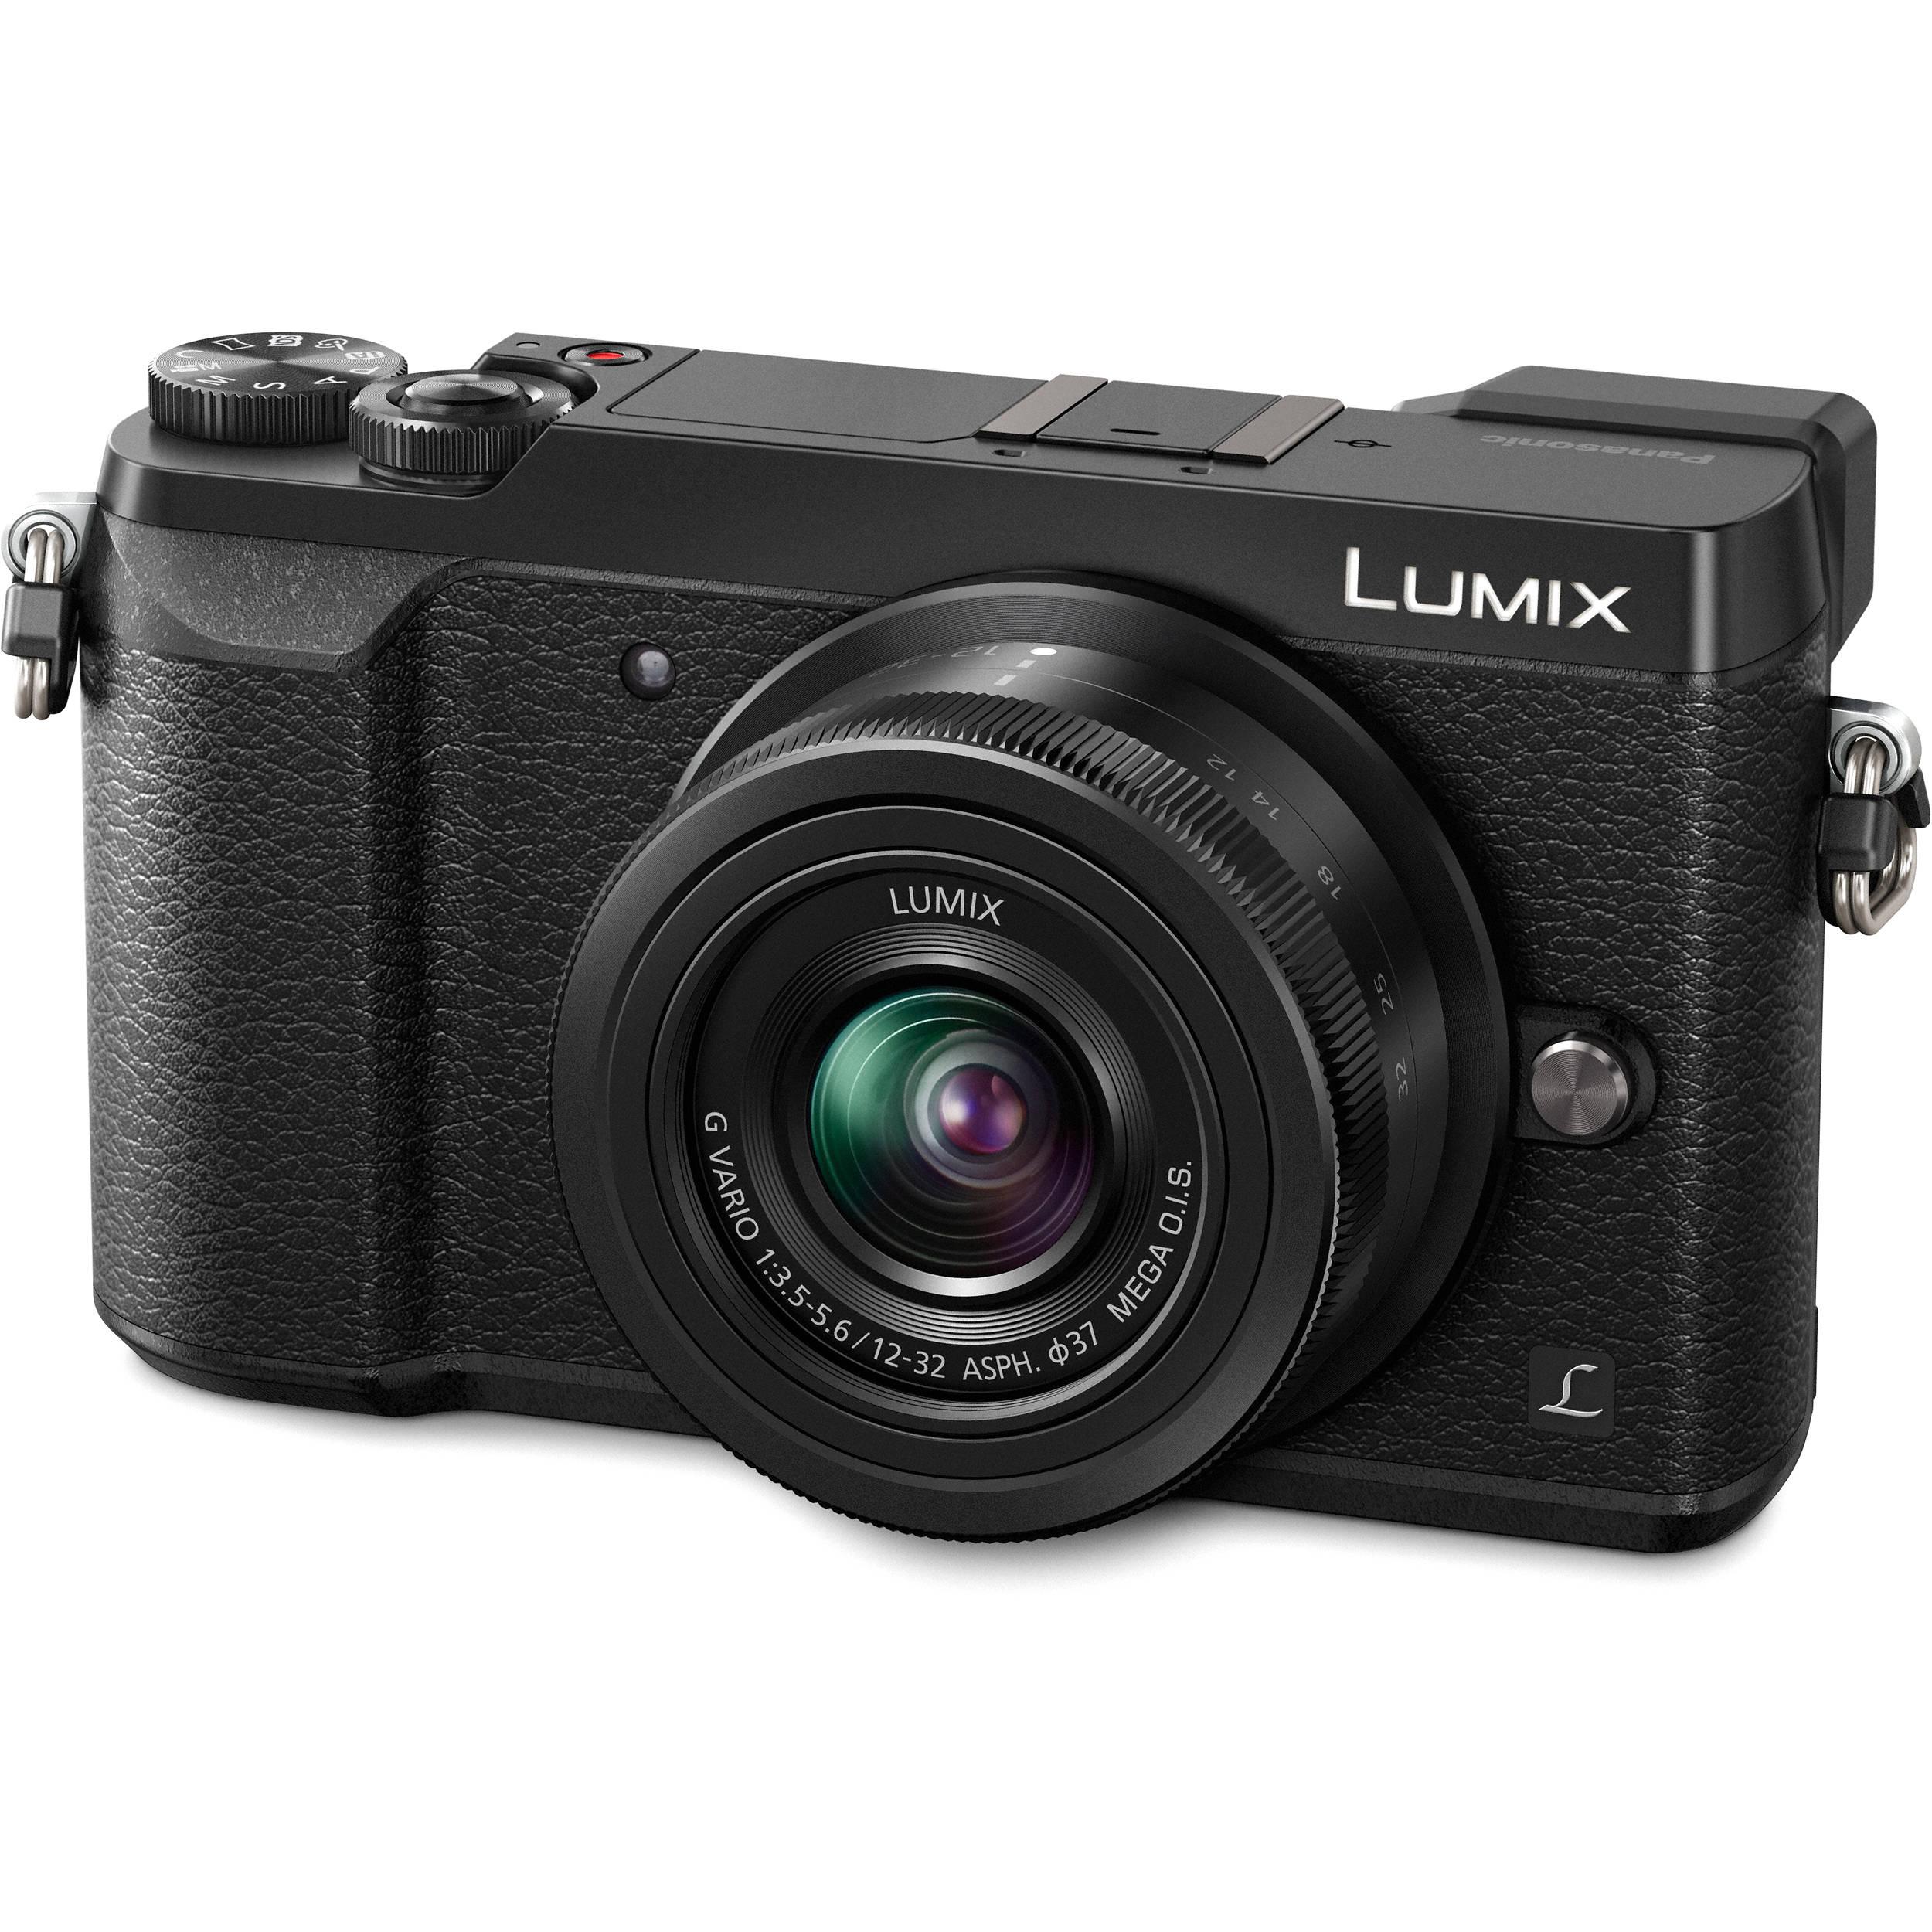 Best Under $1200 - Panasonic GX85 /Lumix G Leica DG Summilux 15mm, F1.7 ASPH